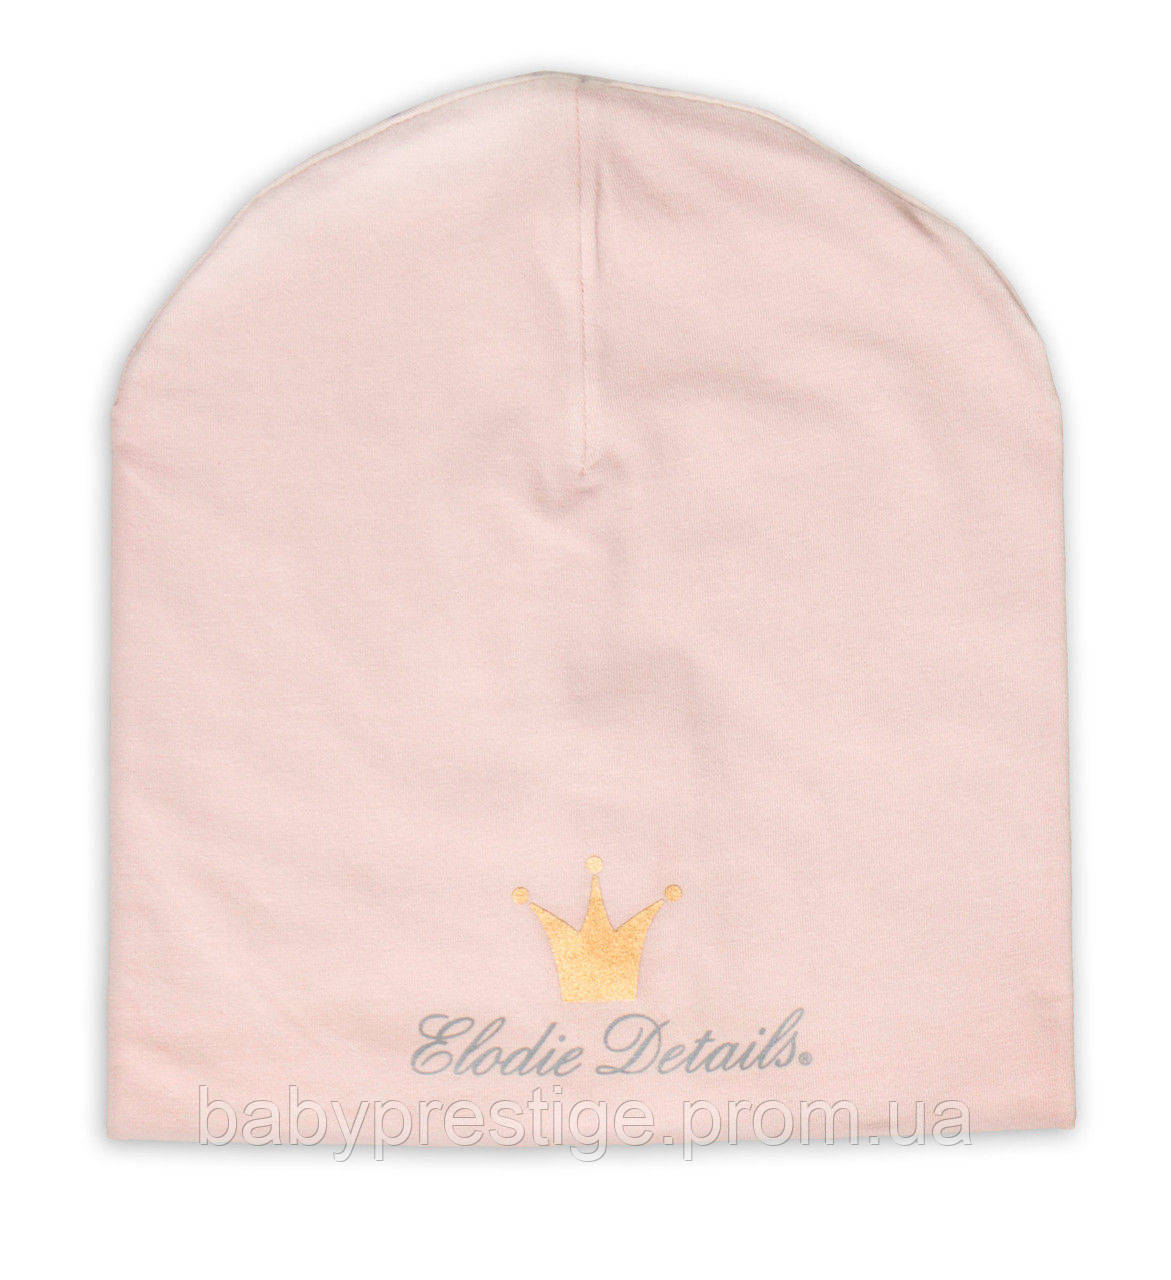 Elodie details шапка - бини Powder Pink, 0-6 мес